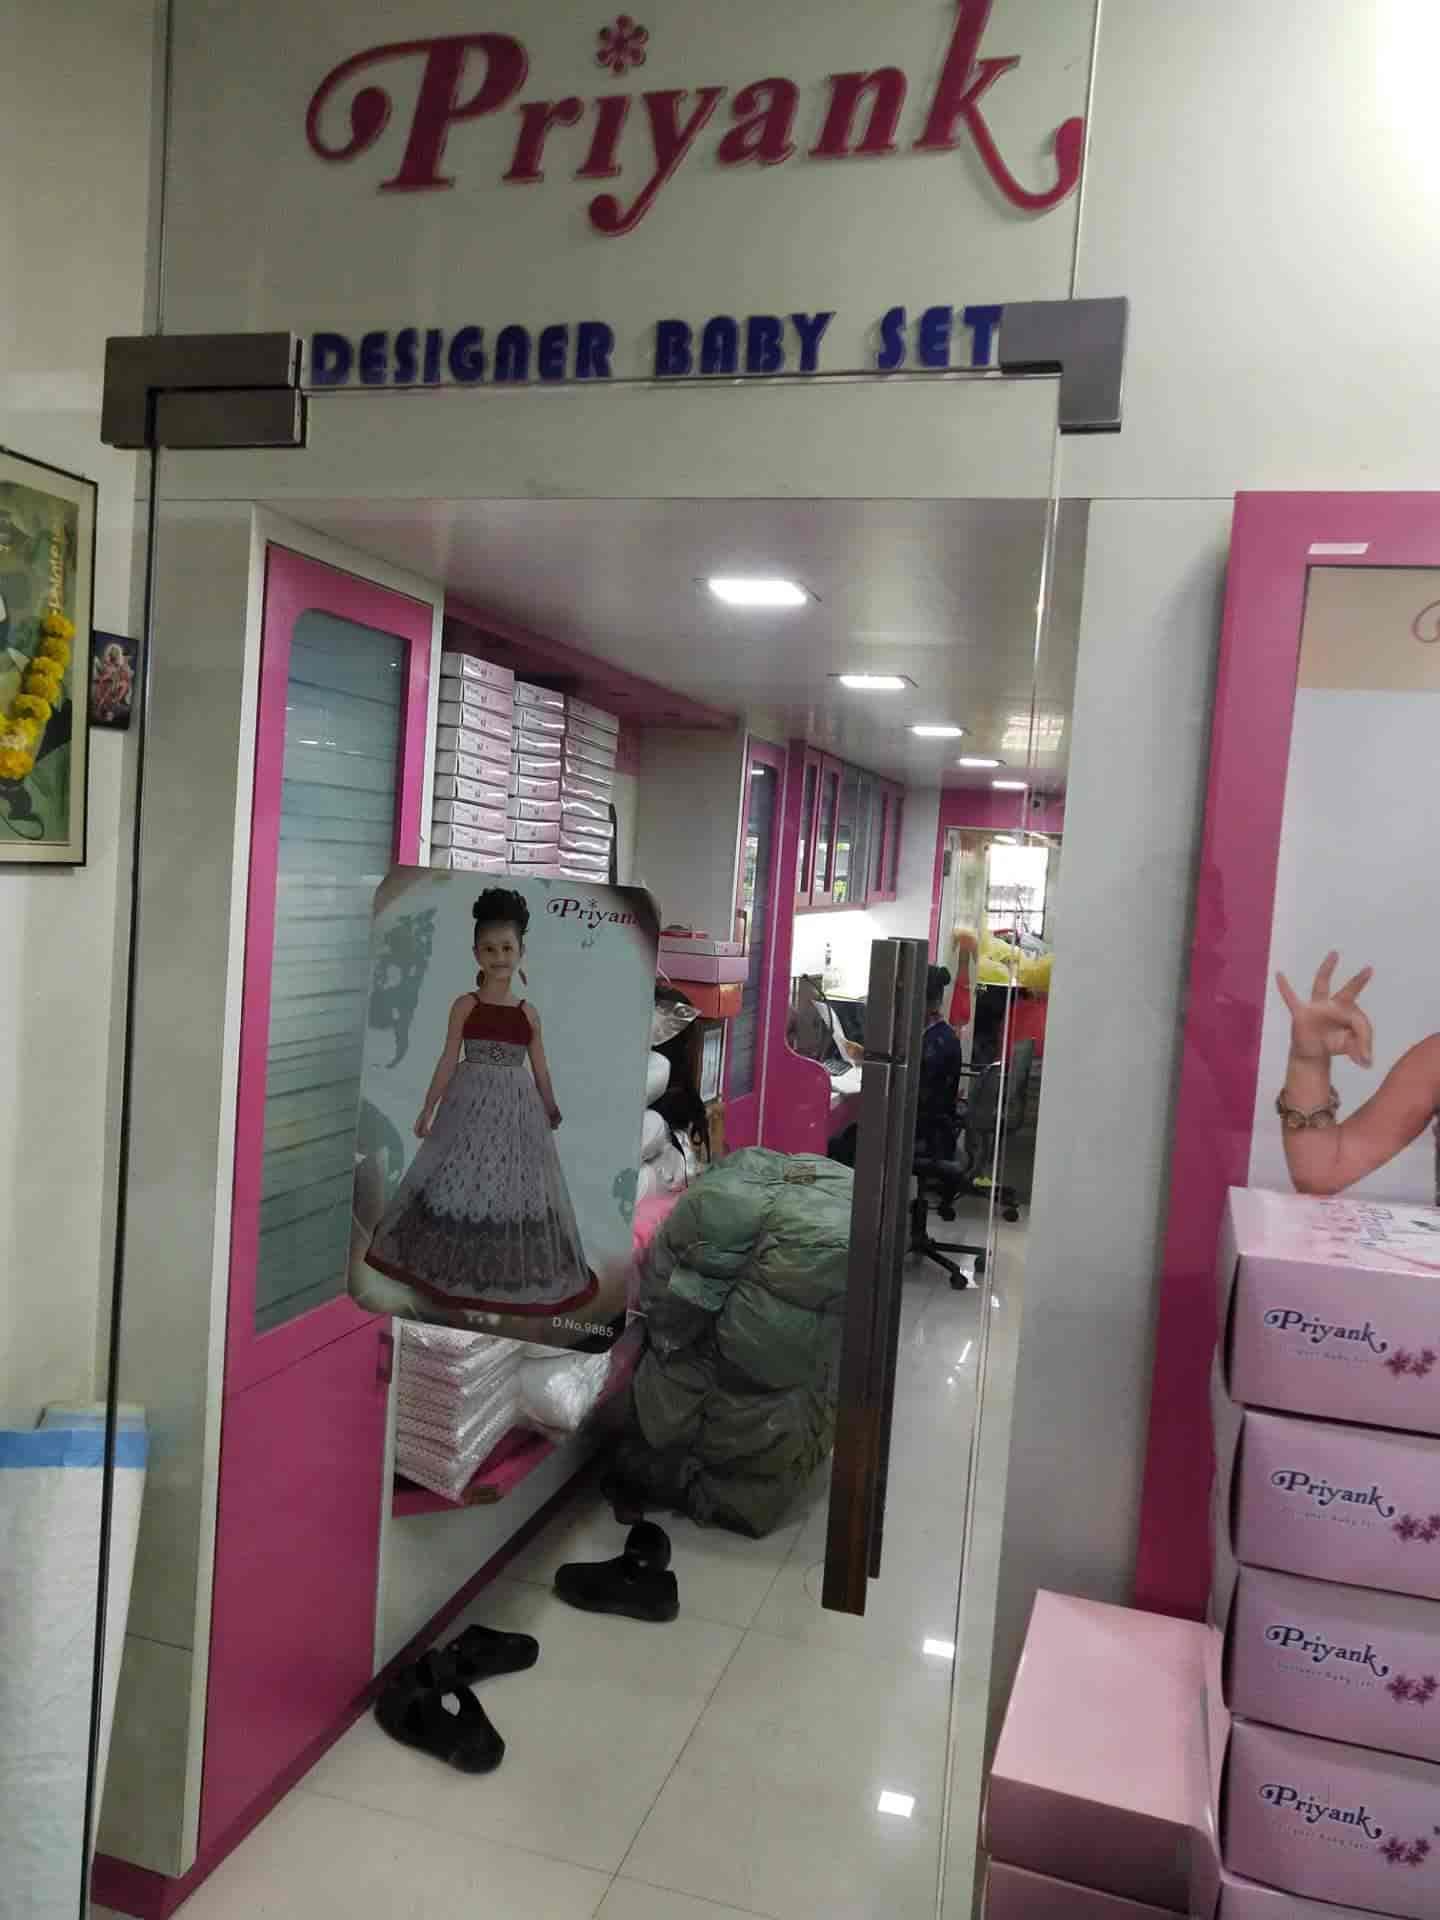 e5c1f76e2 Priyank Designer Baby Sets, Dadar West - Readymade Garment Retailers in  Mumbai - Justdial